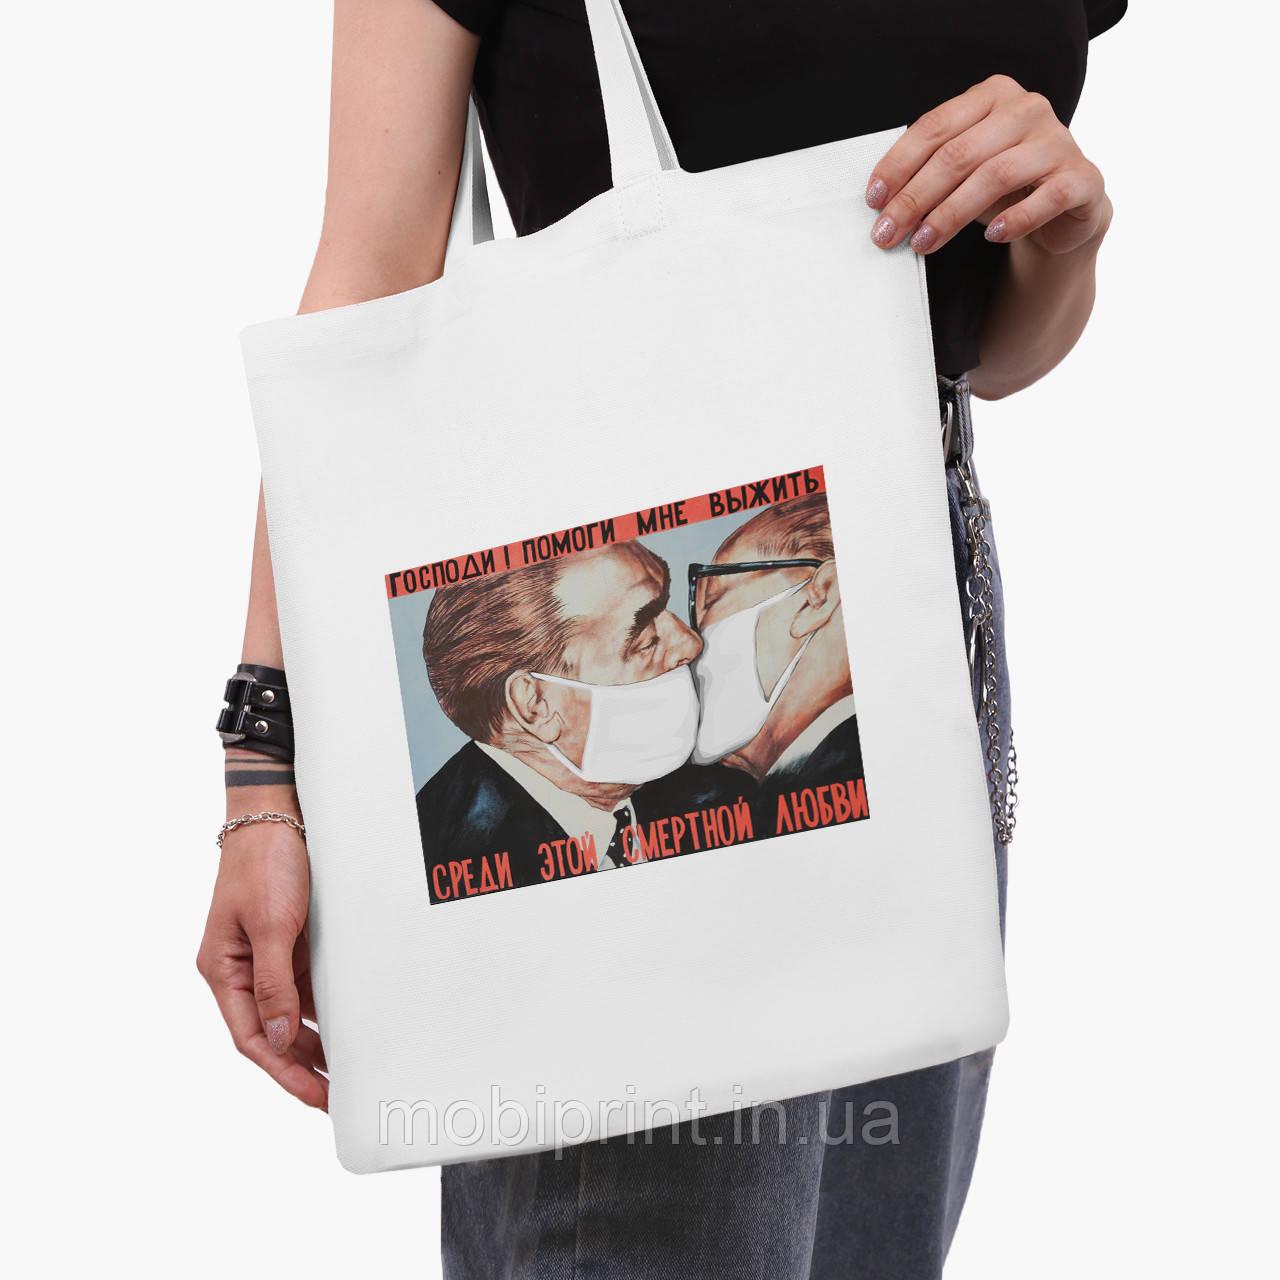 Эко сумка шоппер белая Брежнев поцелуй (Brezhnev kiss) (9227-1424-3)  41*35 см